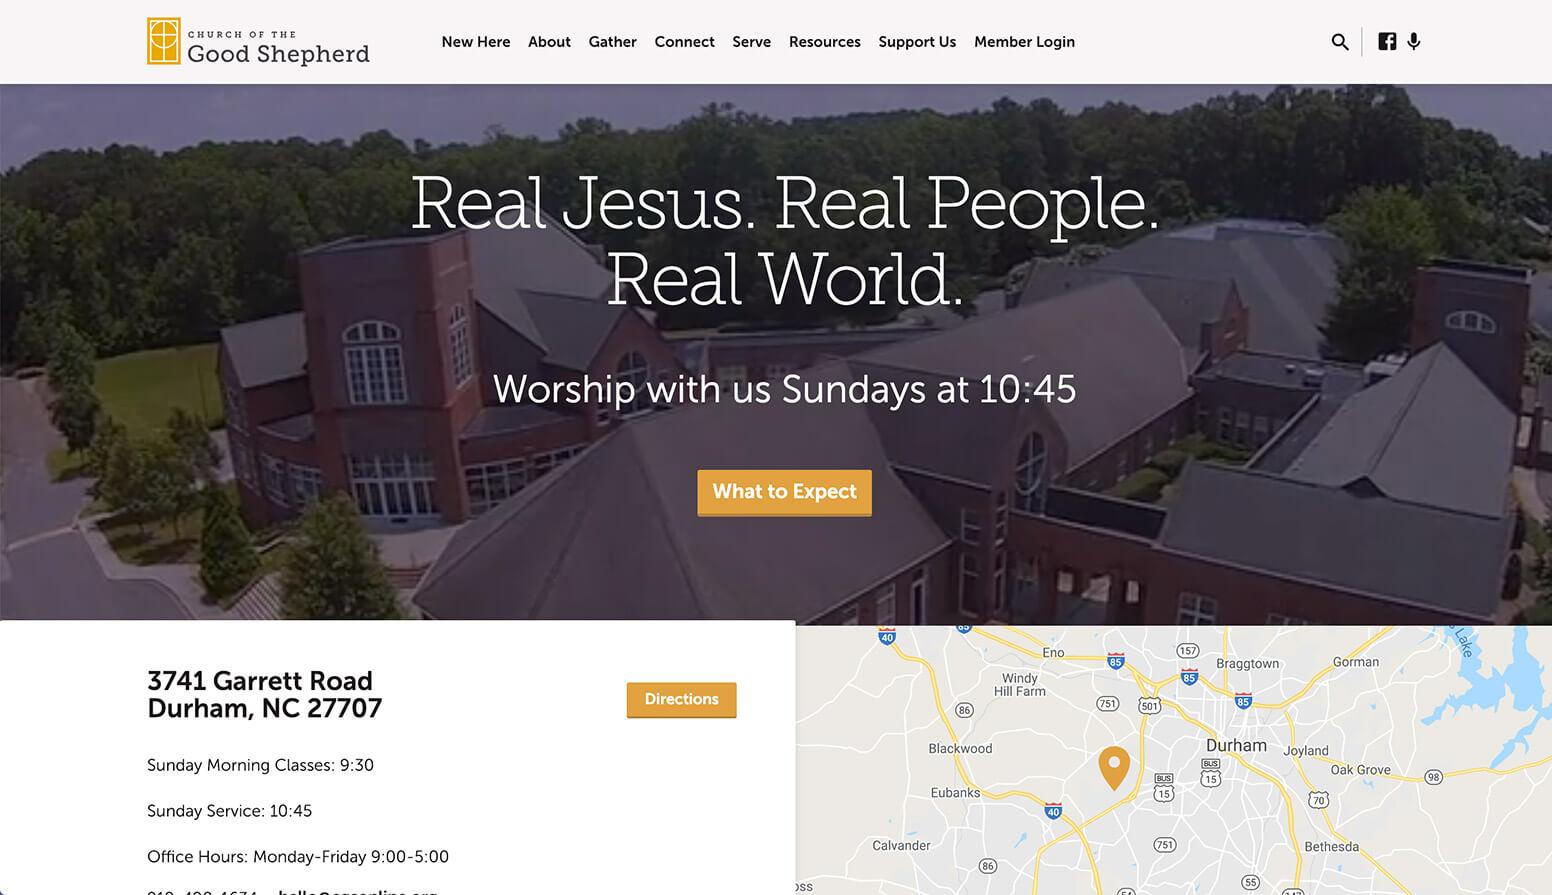 Church of the Good Shepherd Website